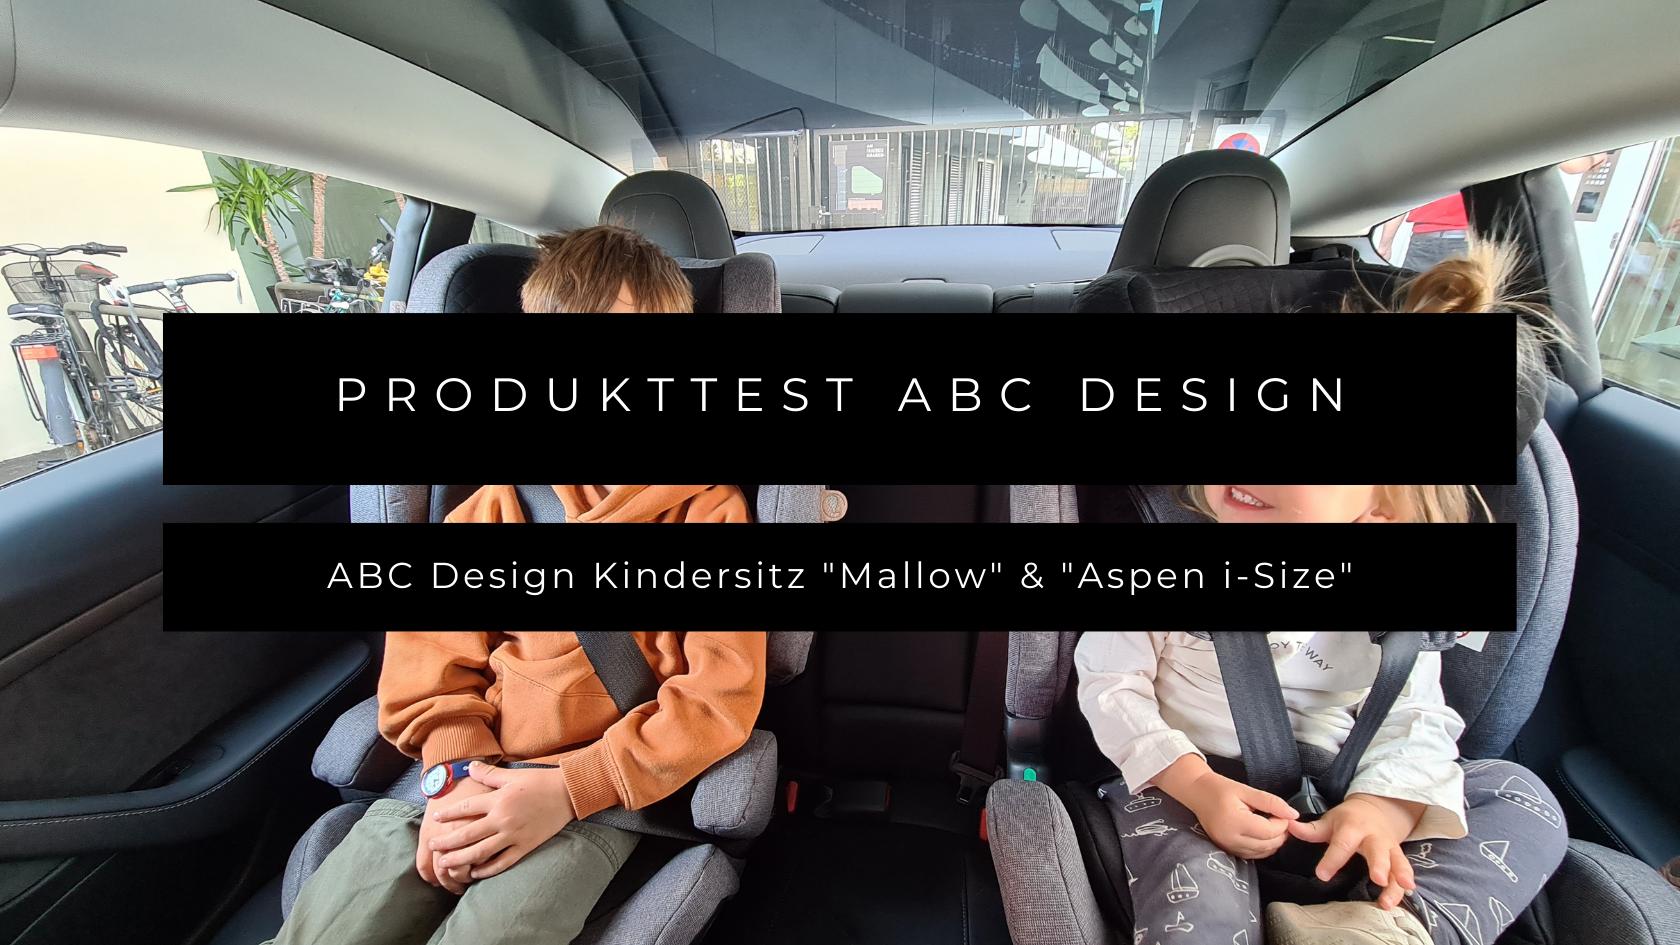 Produkttest: Kindersitze ABC Design Aspen i-Size und Mallow